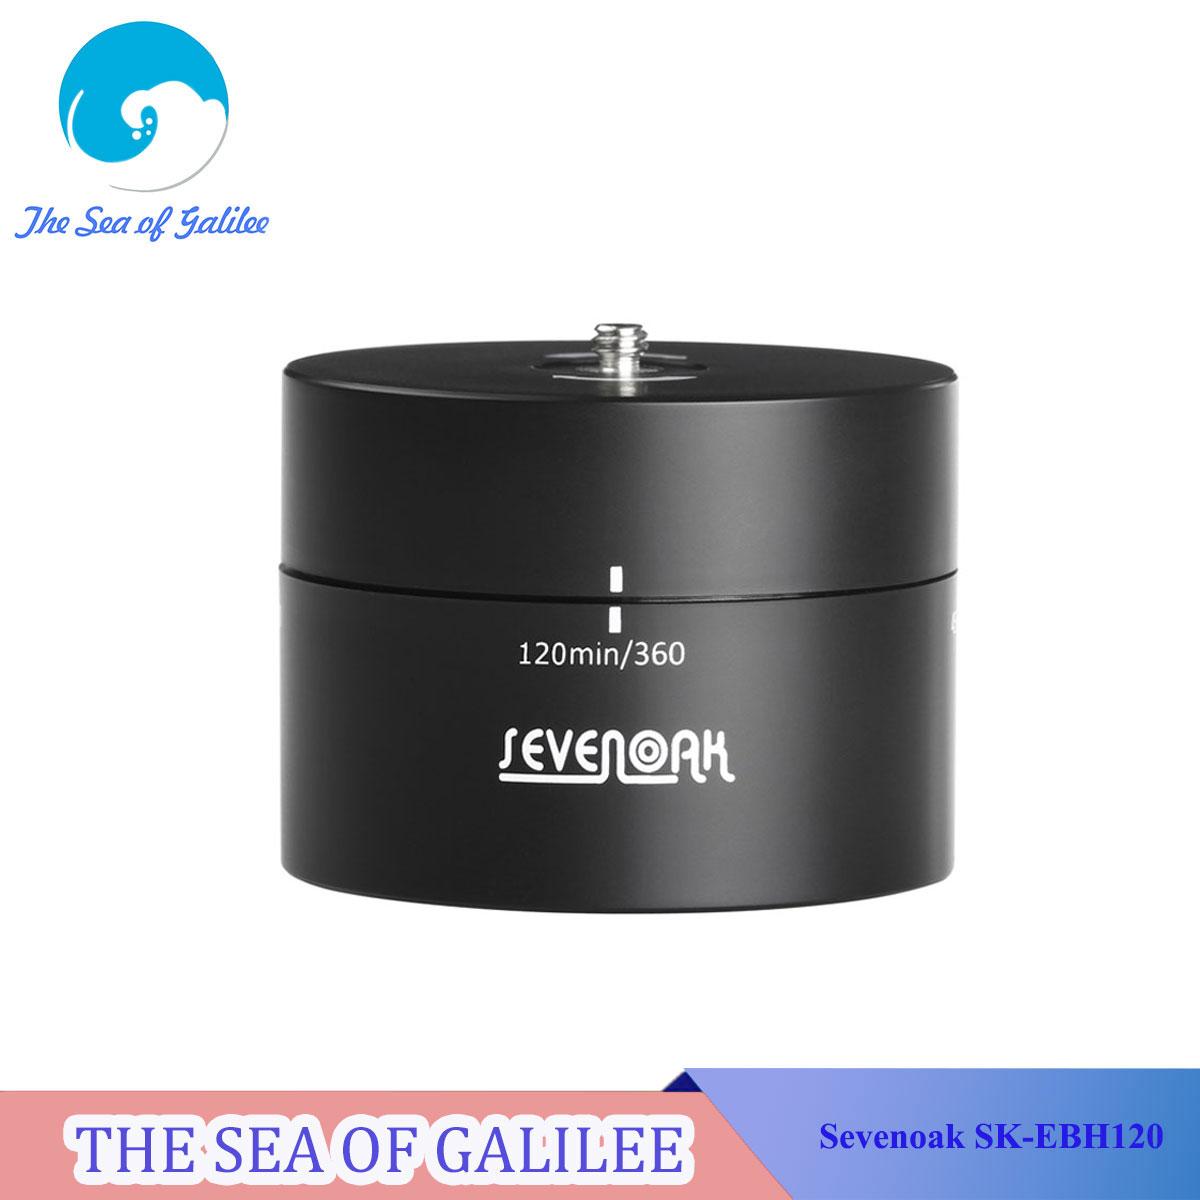 Sevenoak SK-EBH120 Mechanical Panoramic 360 degree Portable tilt head for GoPro&Action Cameras SmartPhones DSLR Cameras(China (Mainland))